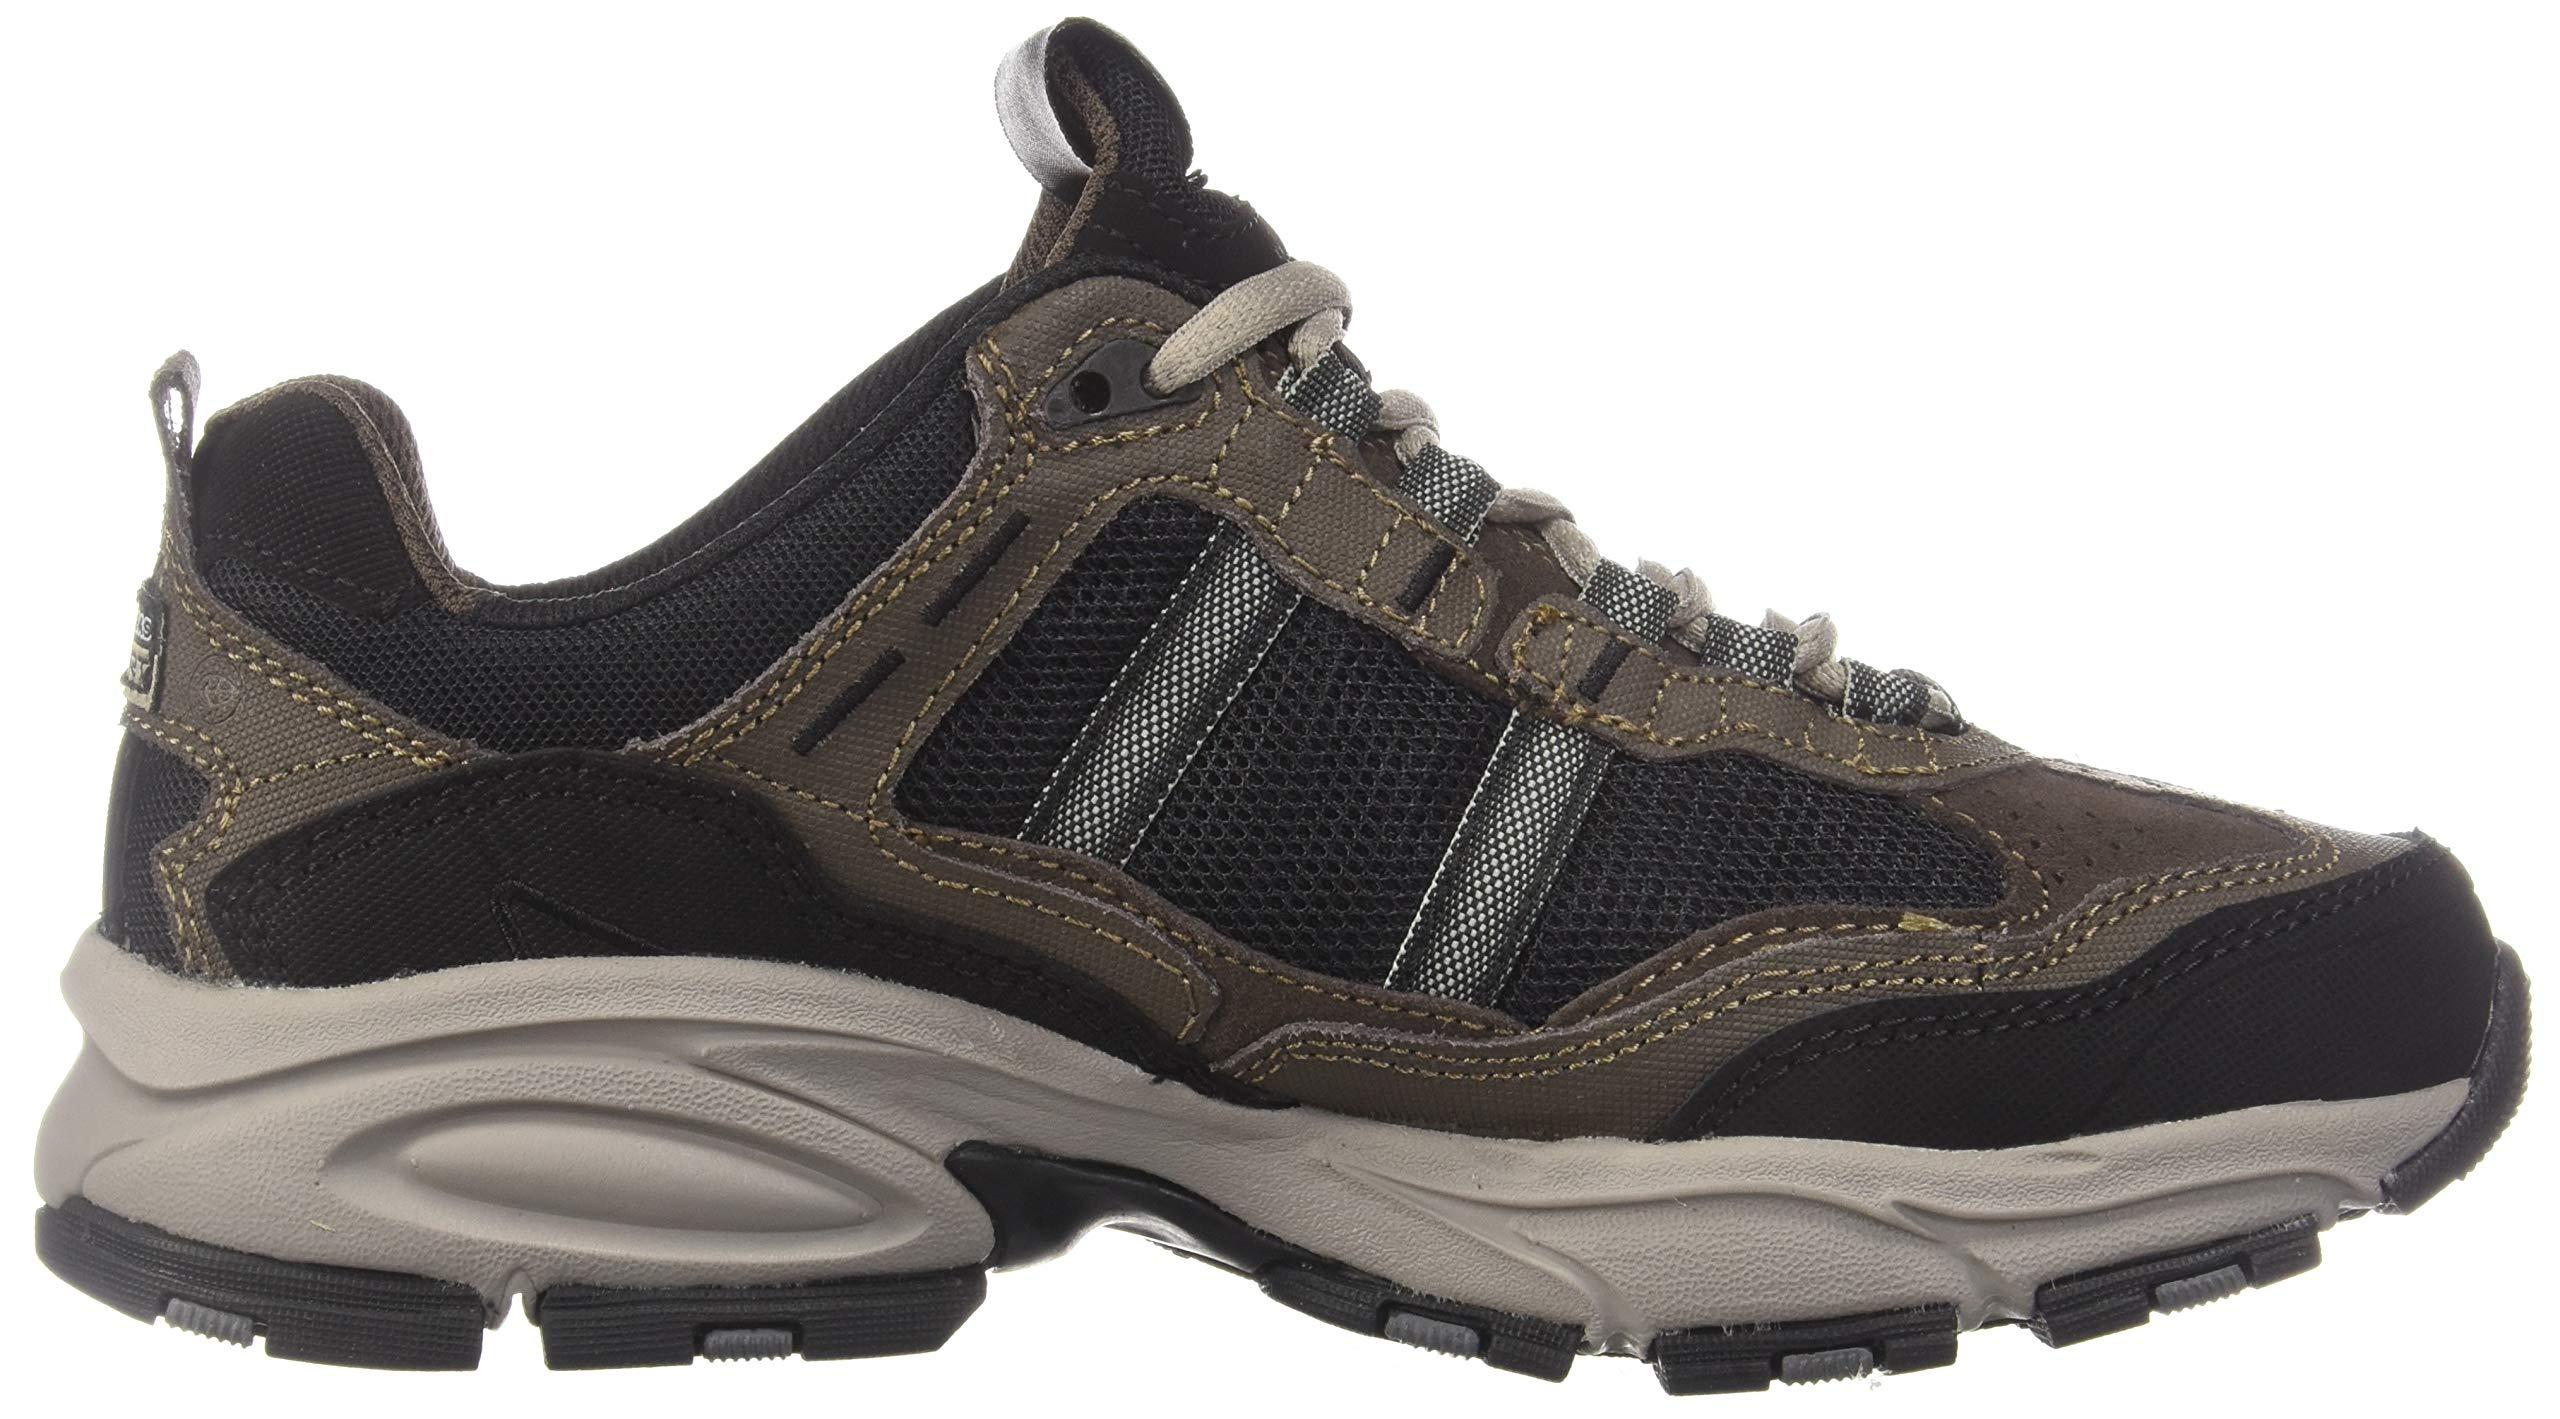 Skechers Sport Men's Vigor 2.0 Trait Memory Foam Sneaker, Brown/Black, 7 M US by Skechers (Image #7)